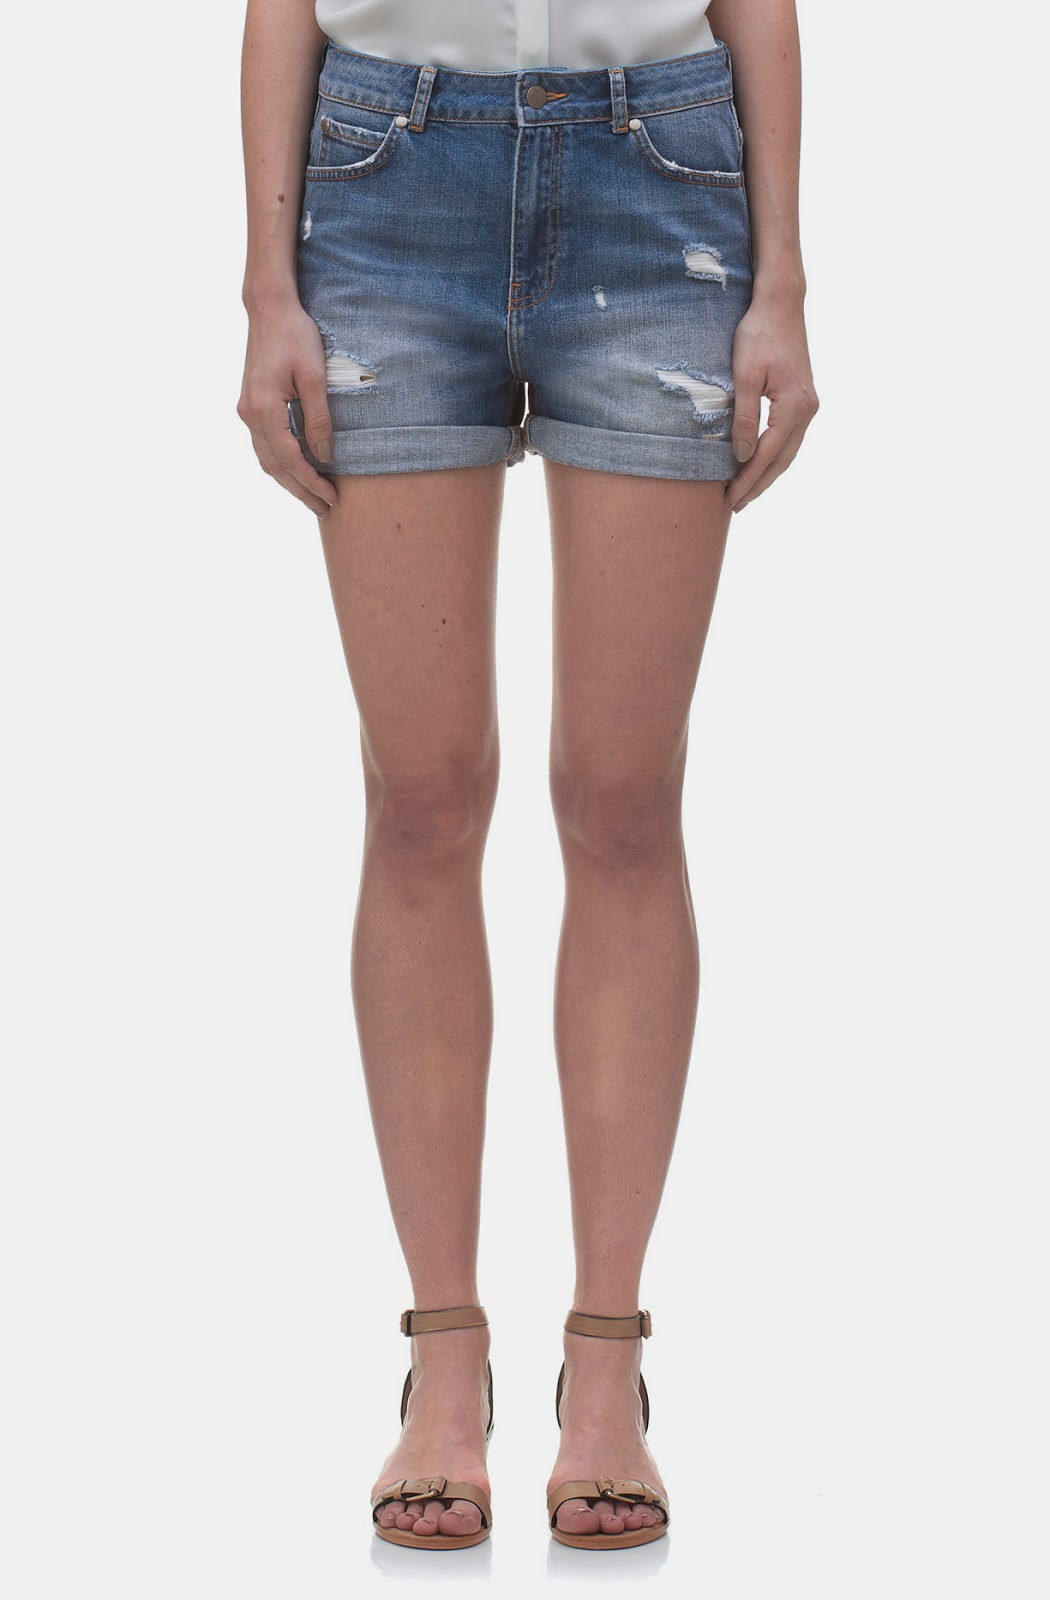 whistles denim shorts